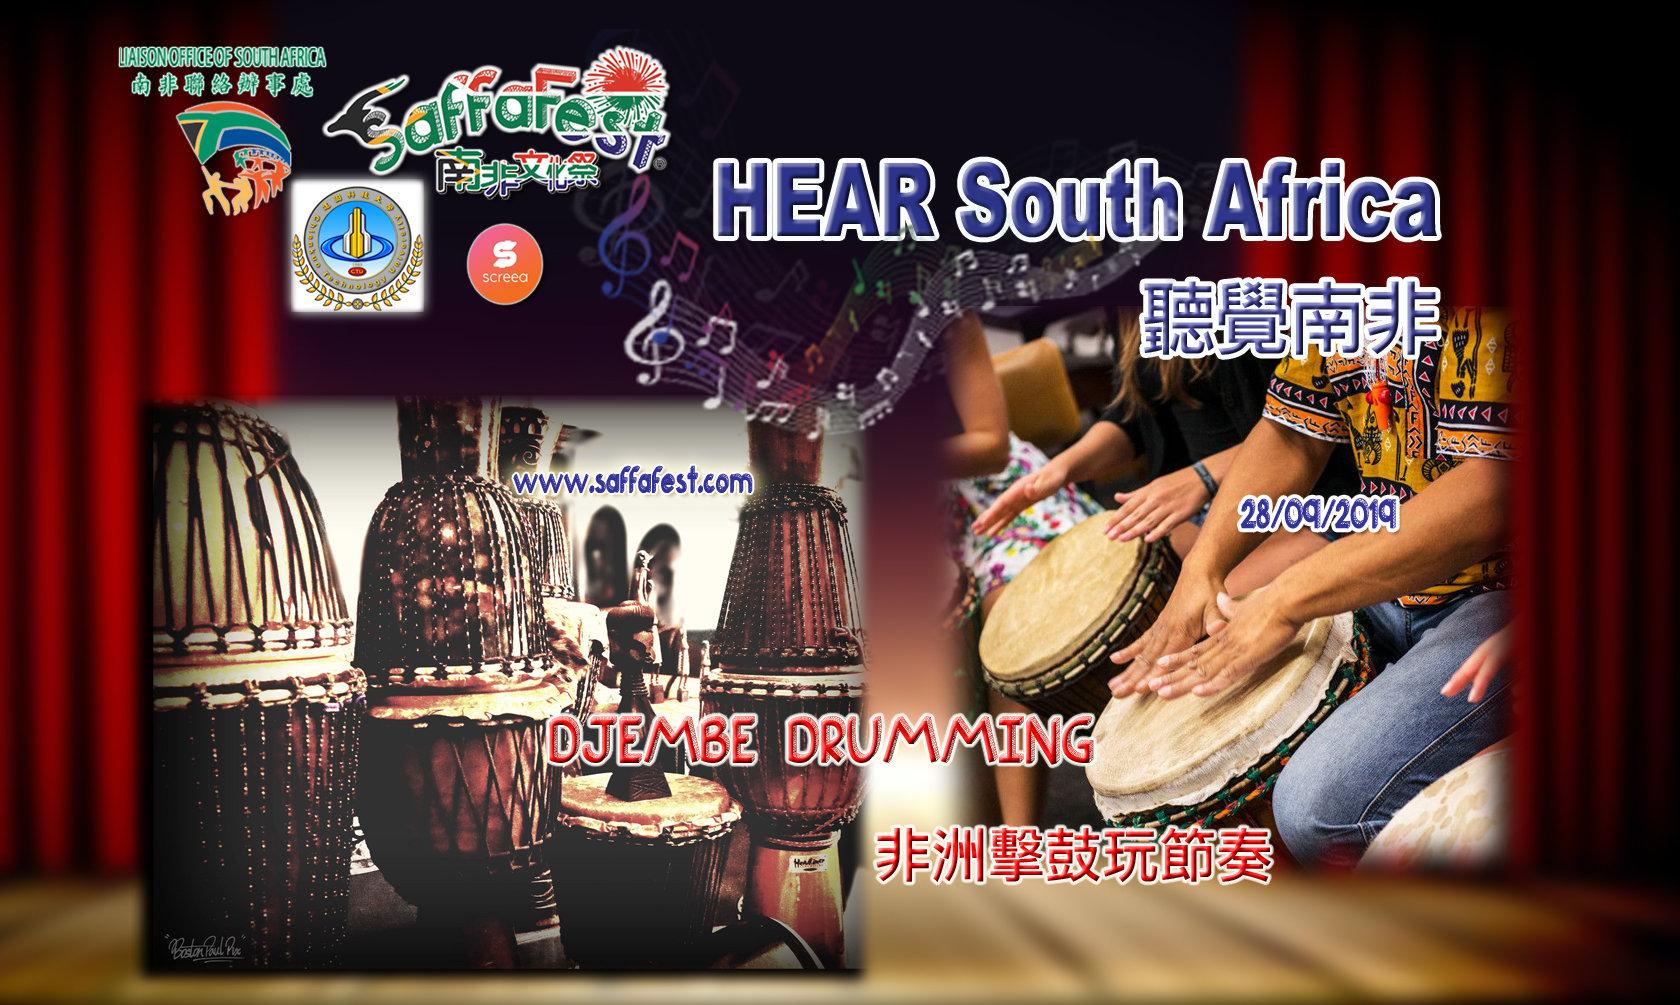 Djembe Drumming Booking 非洲擊鼓玩節奏教學預約報名: